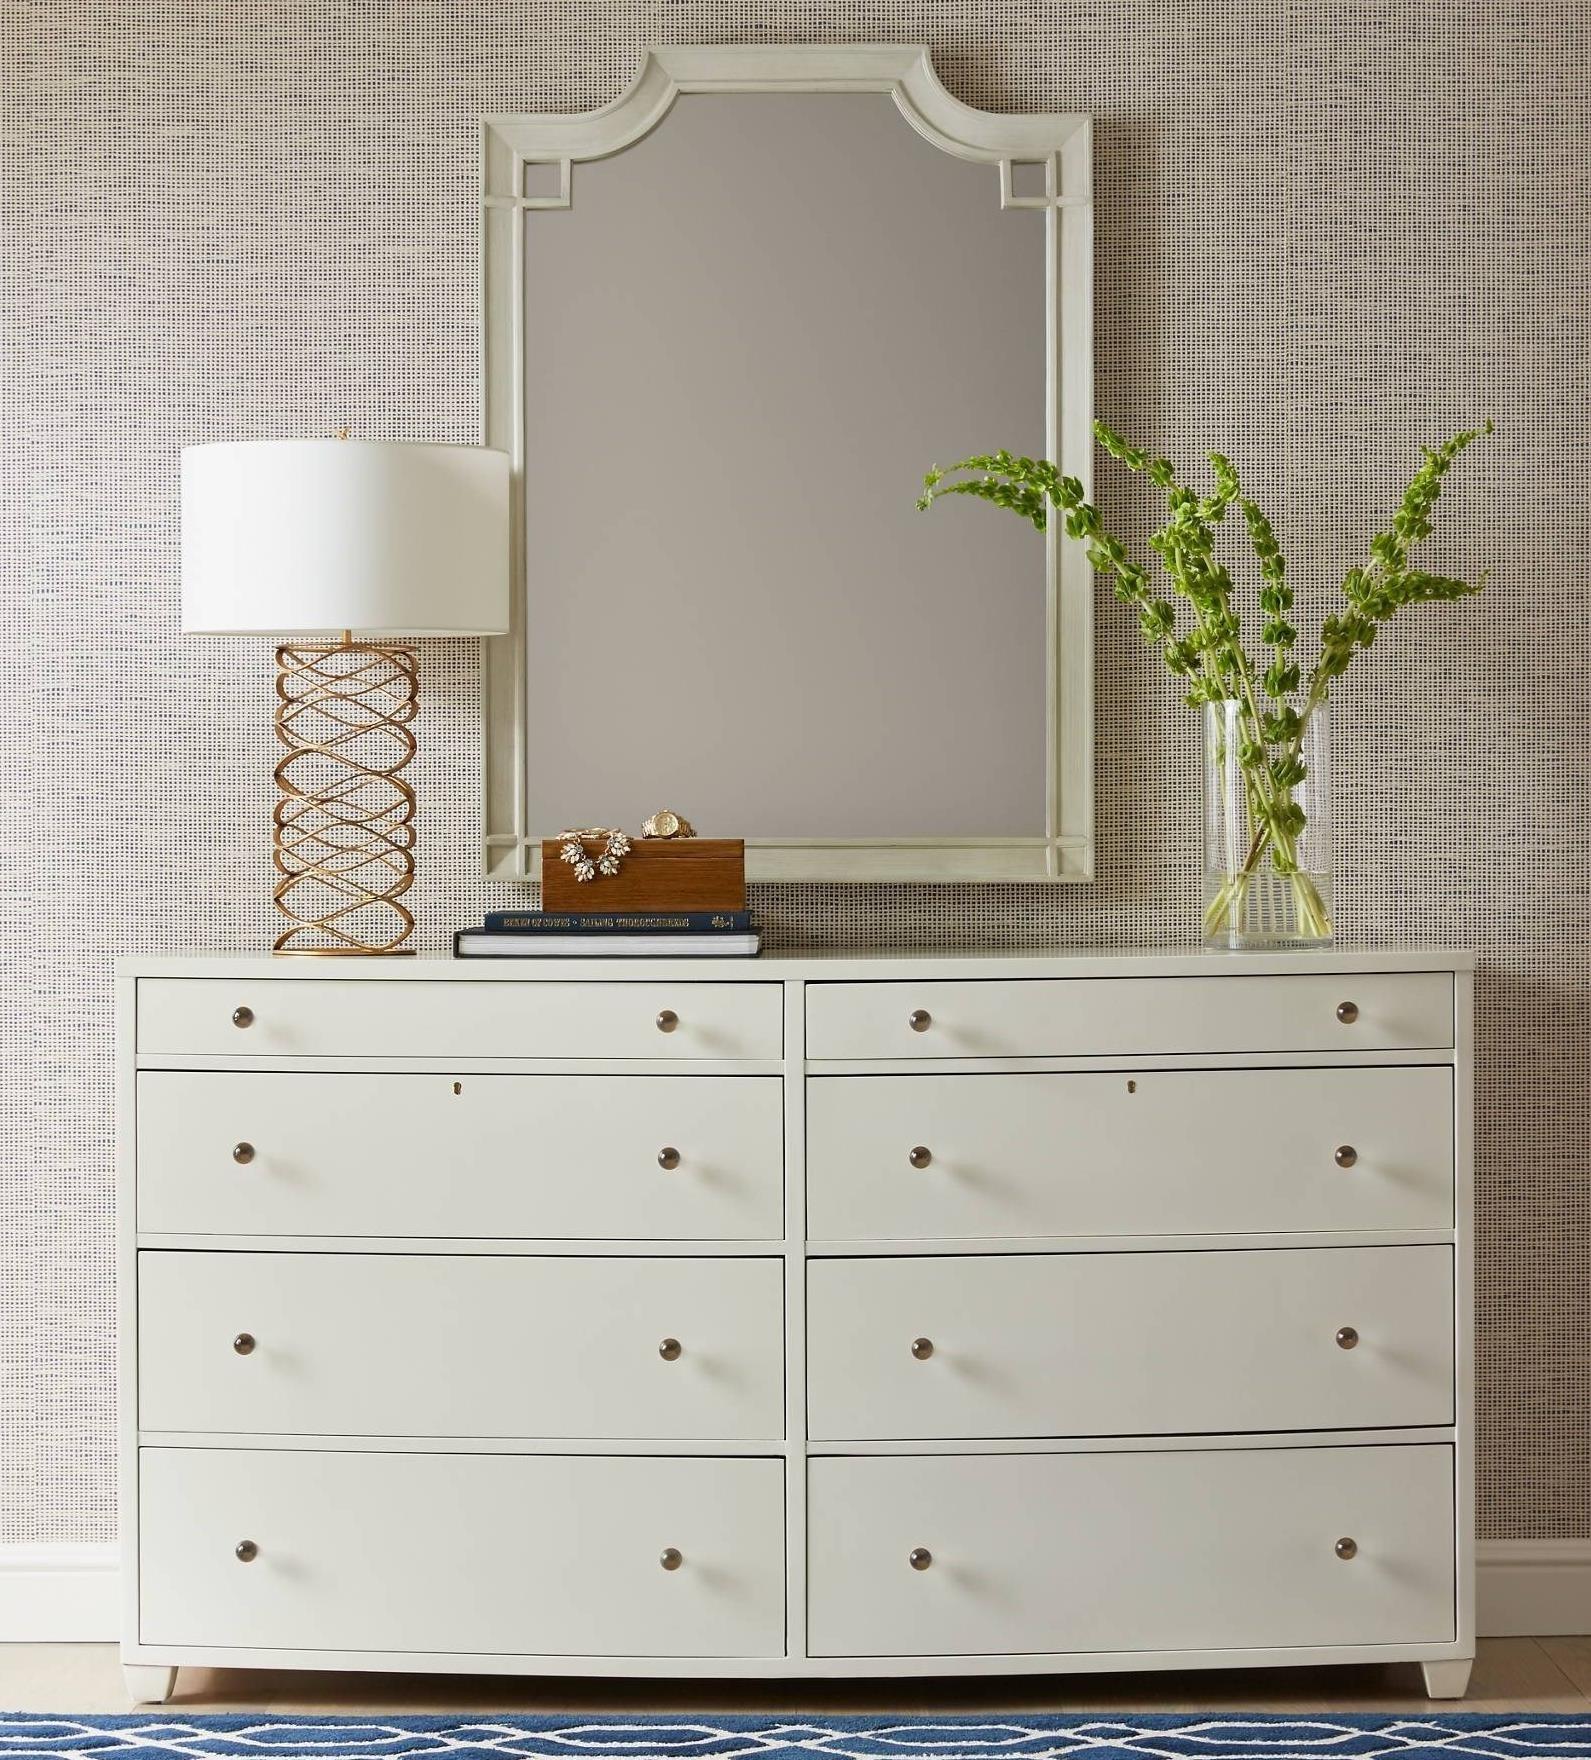 Stanley Furniture Coastal Living Oasis Ocean Park Dresser & Silver Lake Mirror - Item Number: 527-23-06+53-30